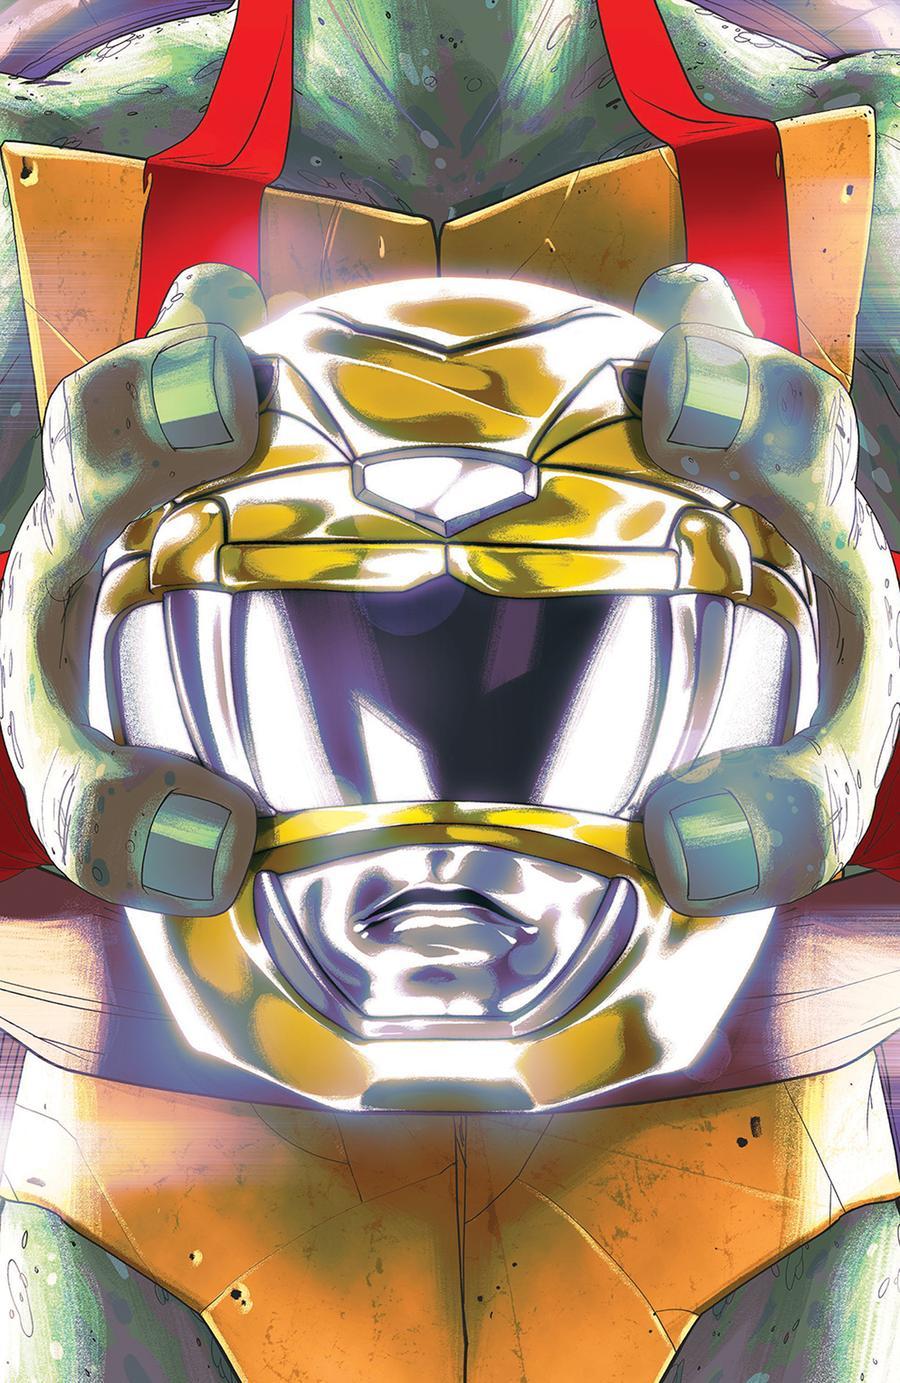 Mighty Morphin Power Rangers Teenage Mutant Ninja Turtles #2 Cover C Variant Goni Montes Cover